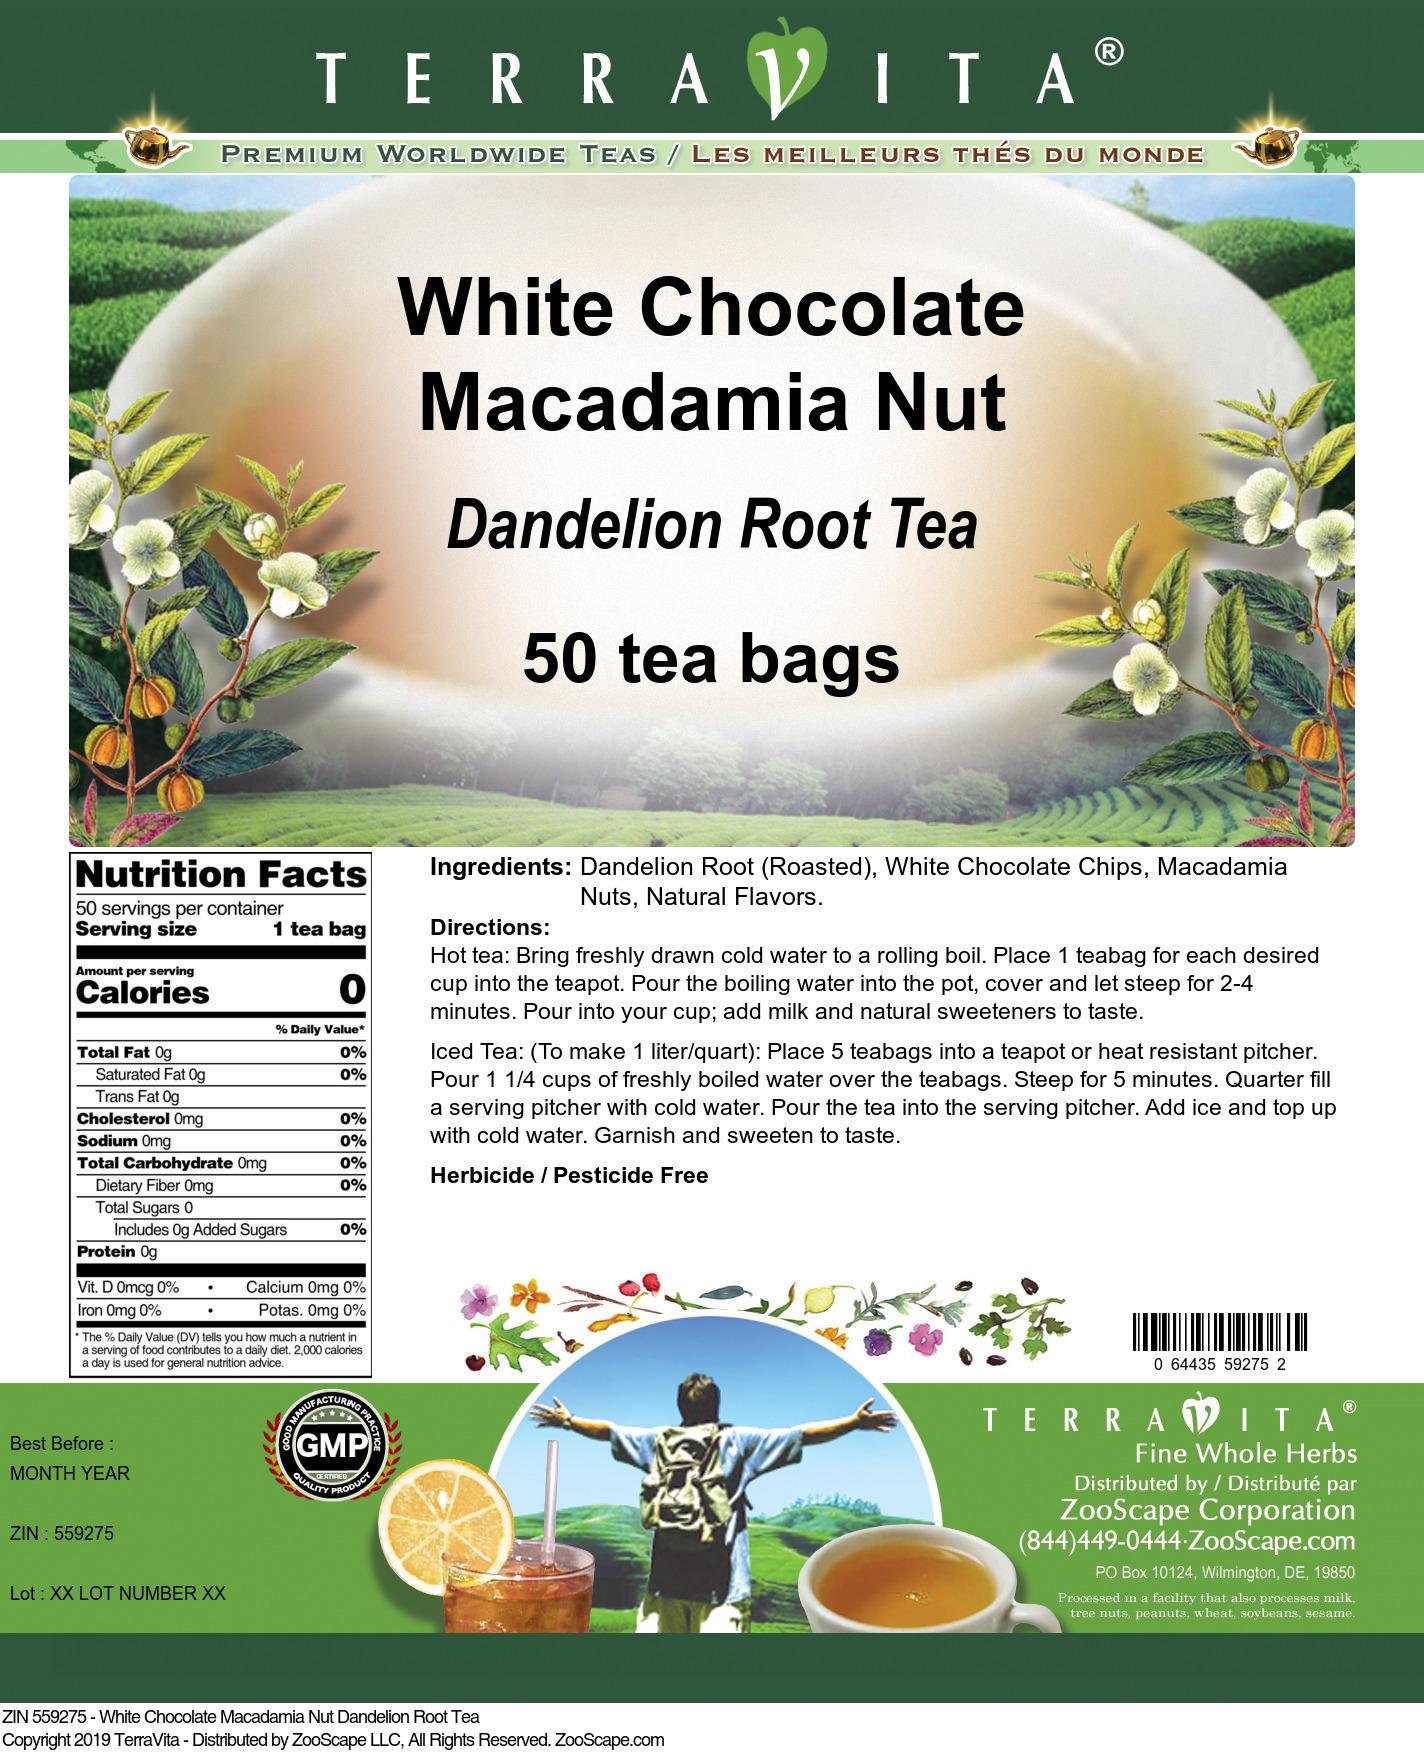 White Chocolate Macadamia Nut Dandelion Root